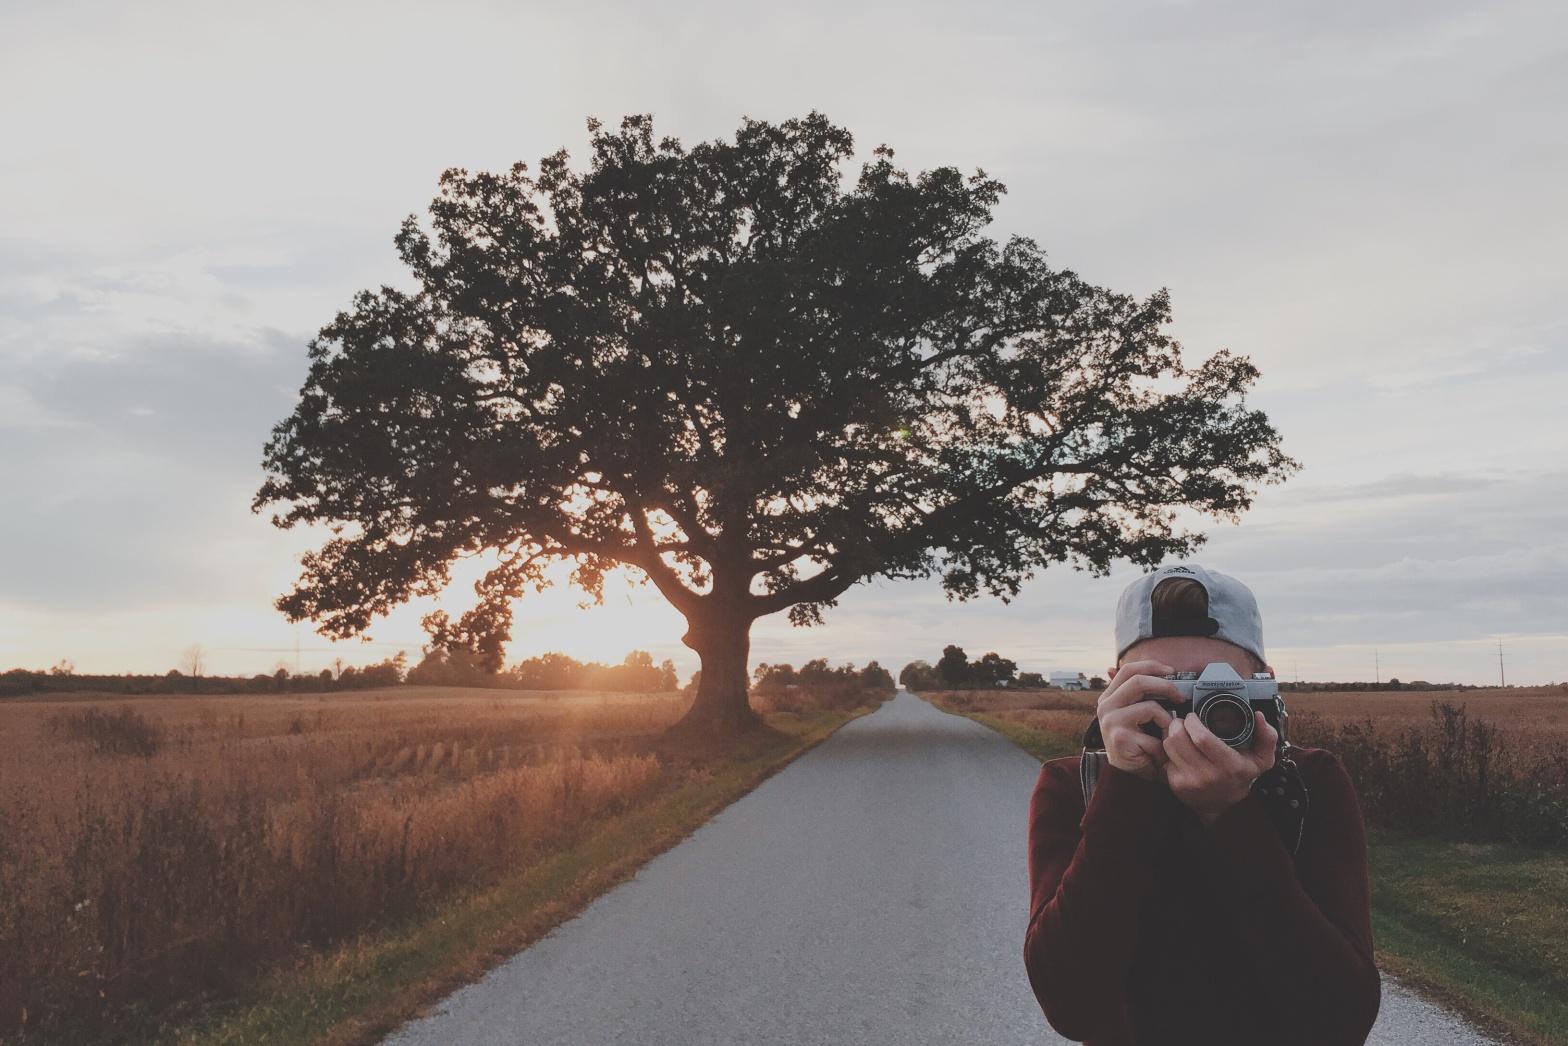 A boy with a camera